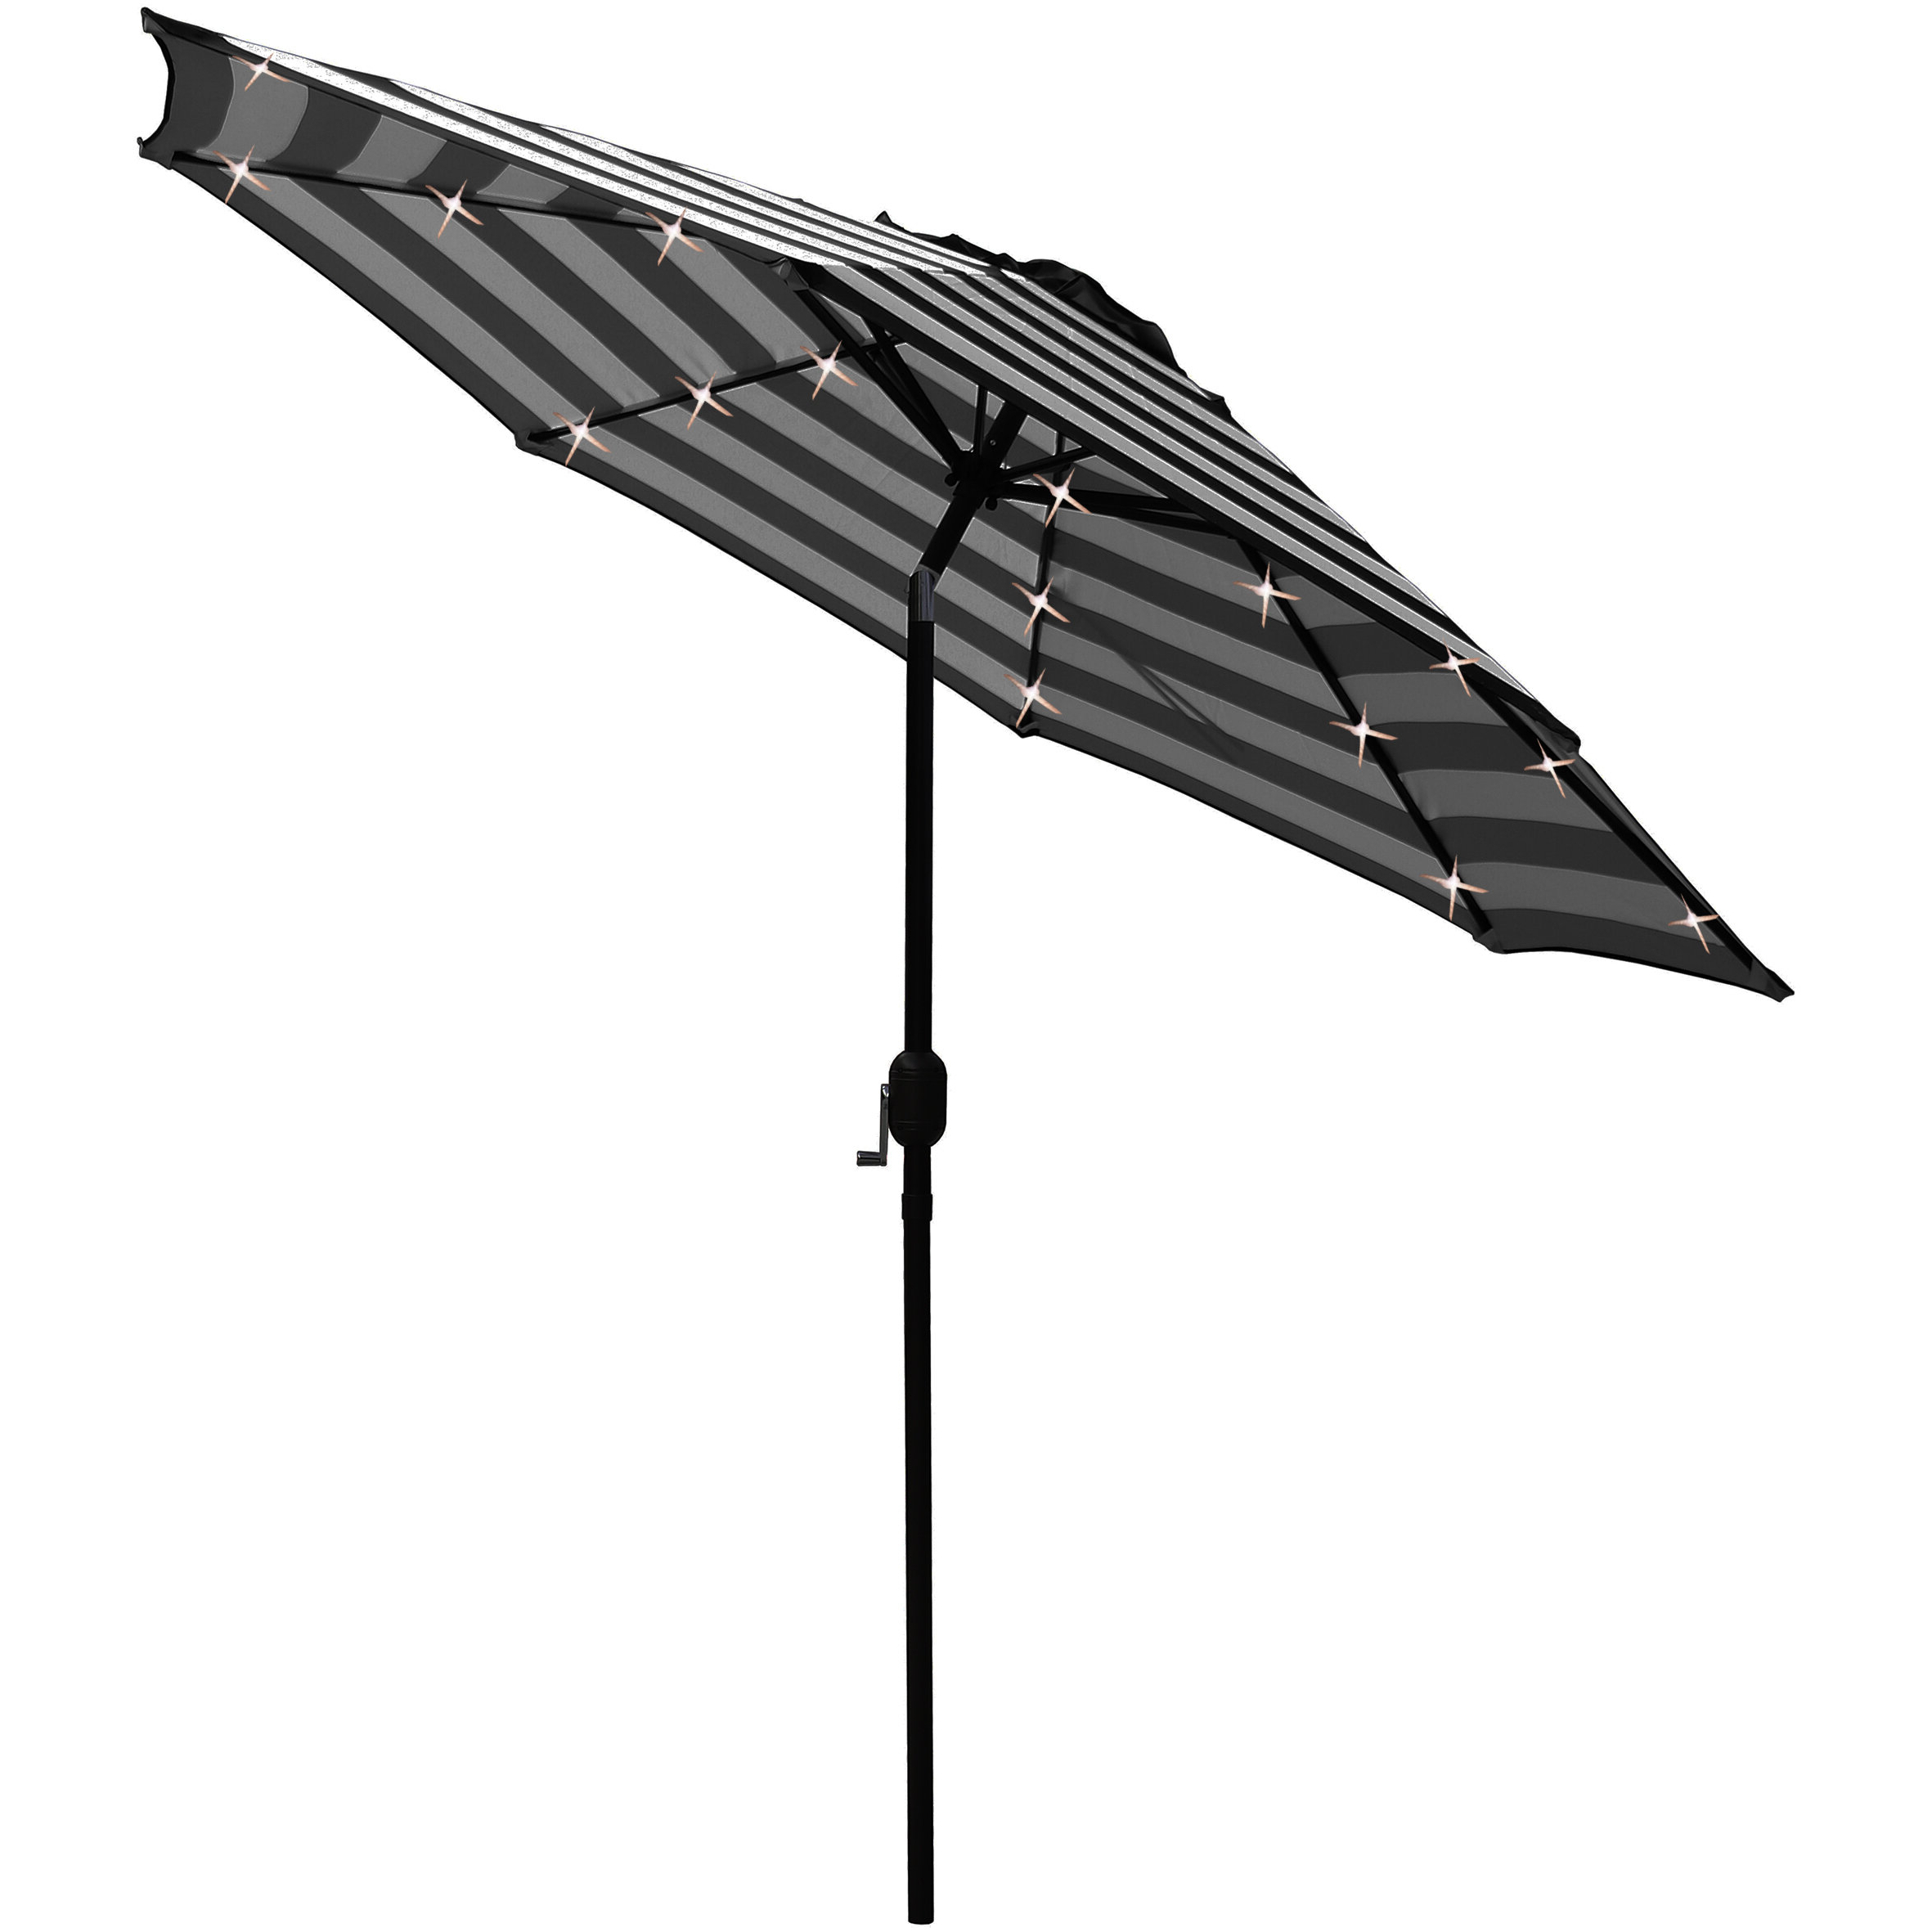 Solar Led Lighted Patio 9' Black Market Umbrella Regarding 2019 Venice Lighted Umbrellas (View 9 of 20)